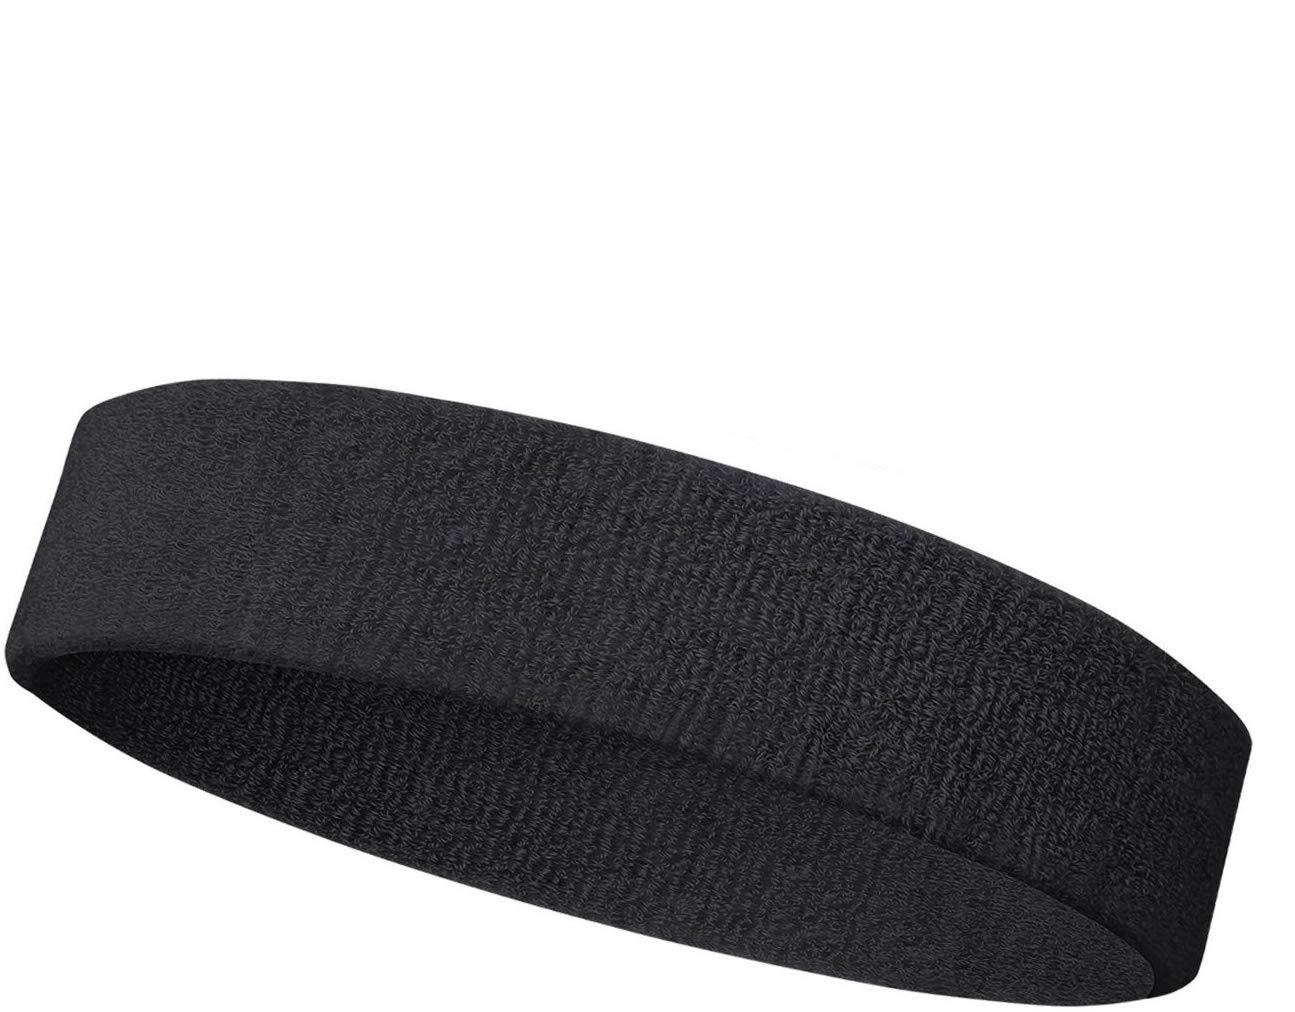 Black Outdoor Fitness Sports Sweatband Headband Yoga Gym Head Band